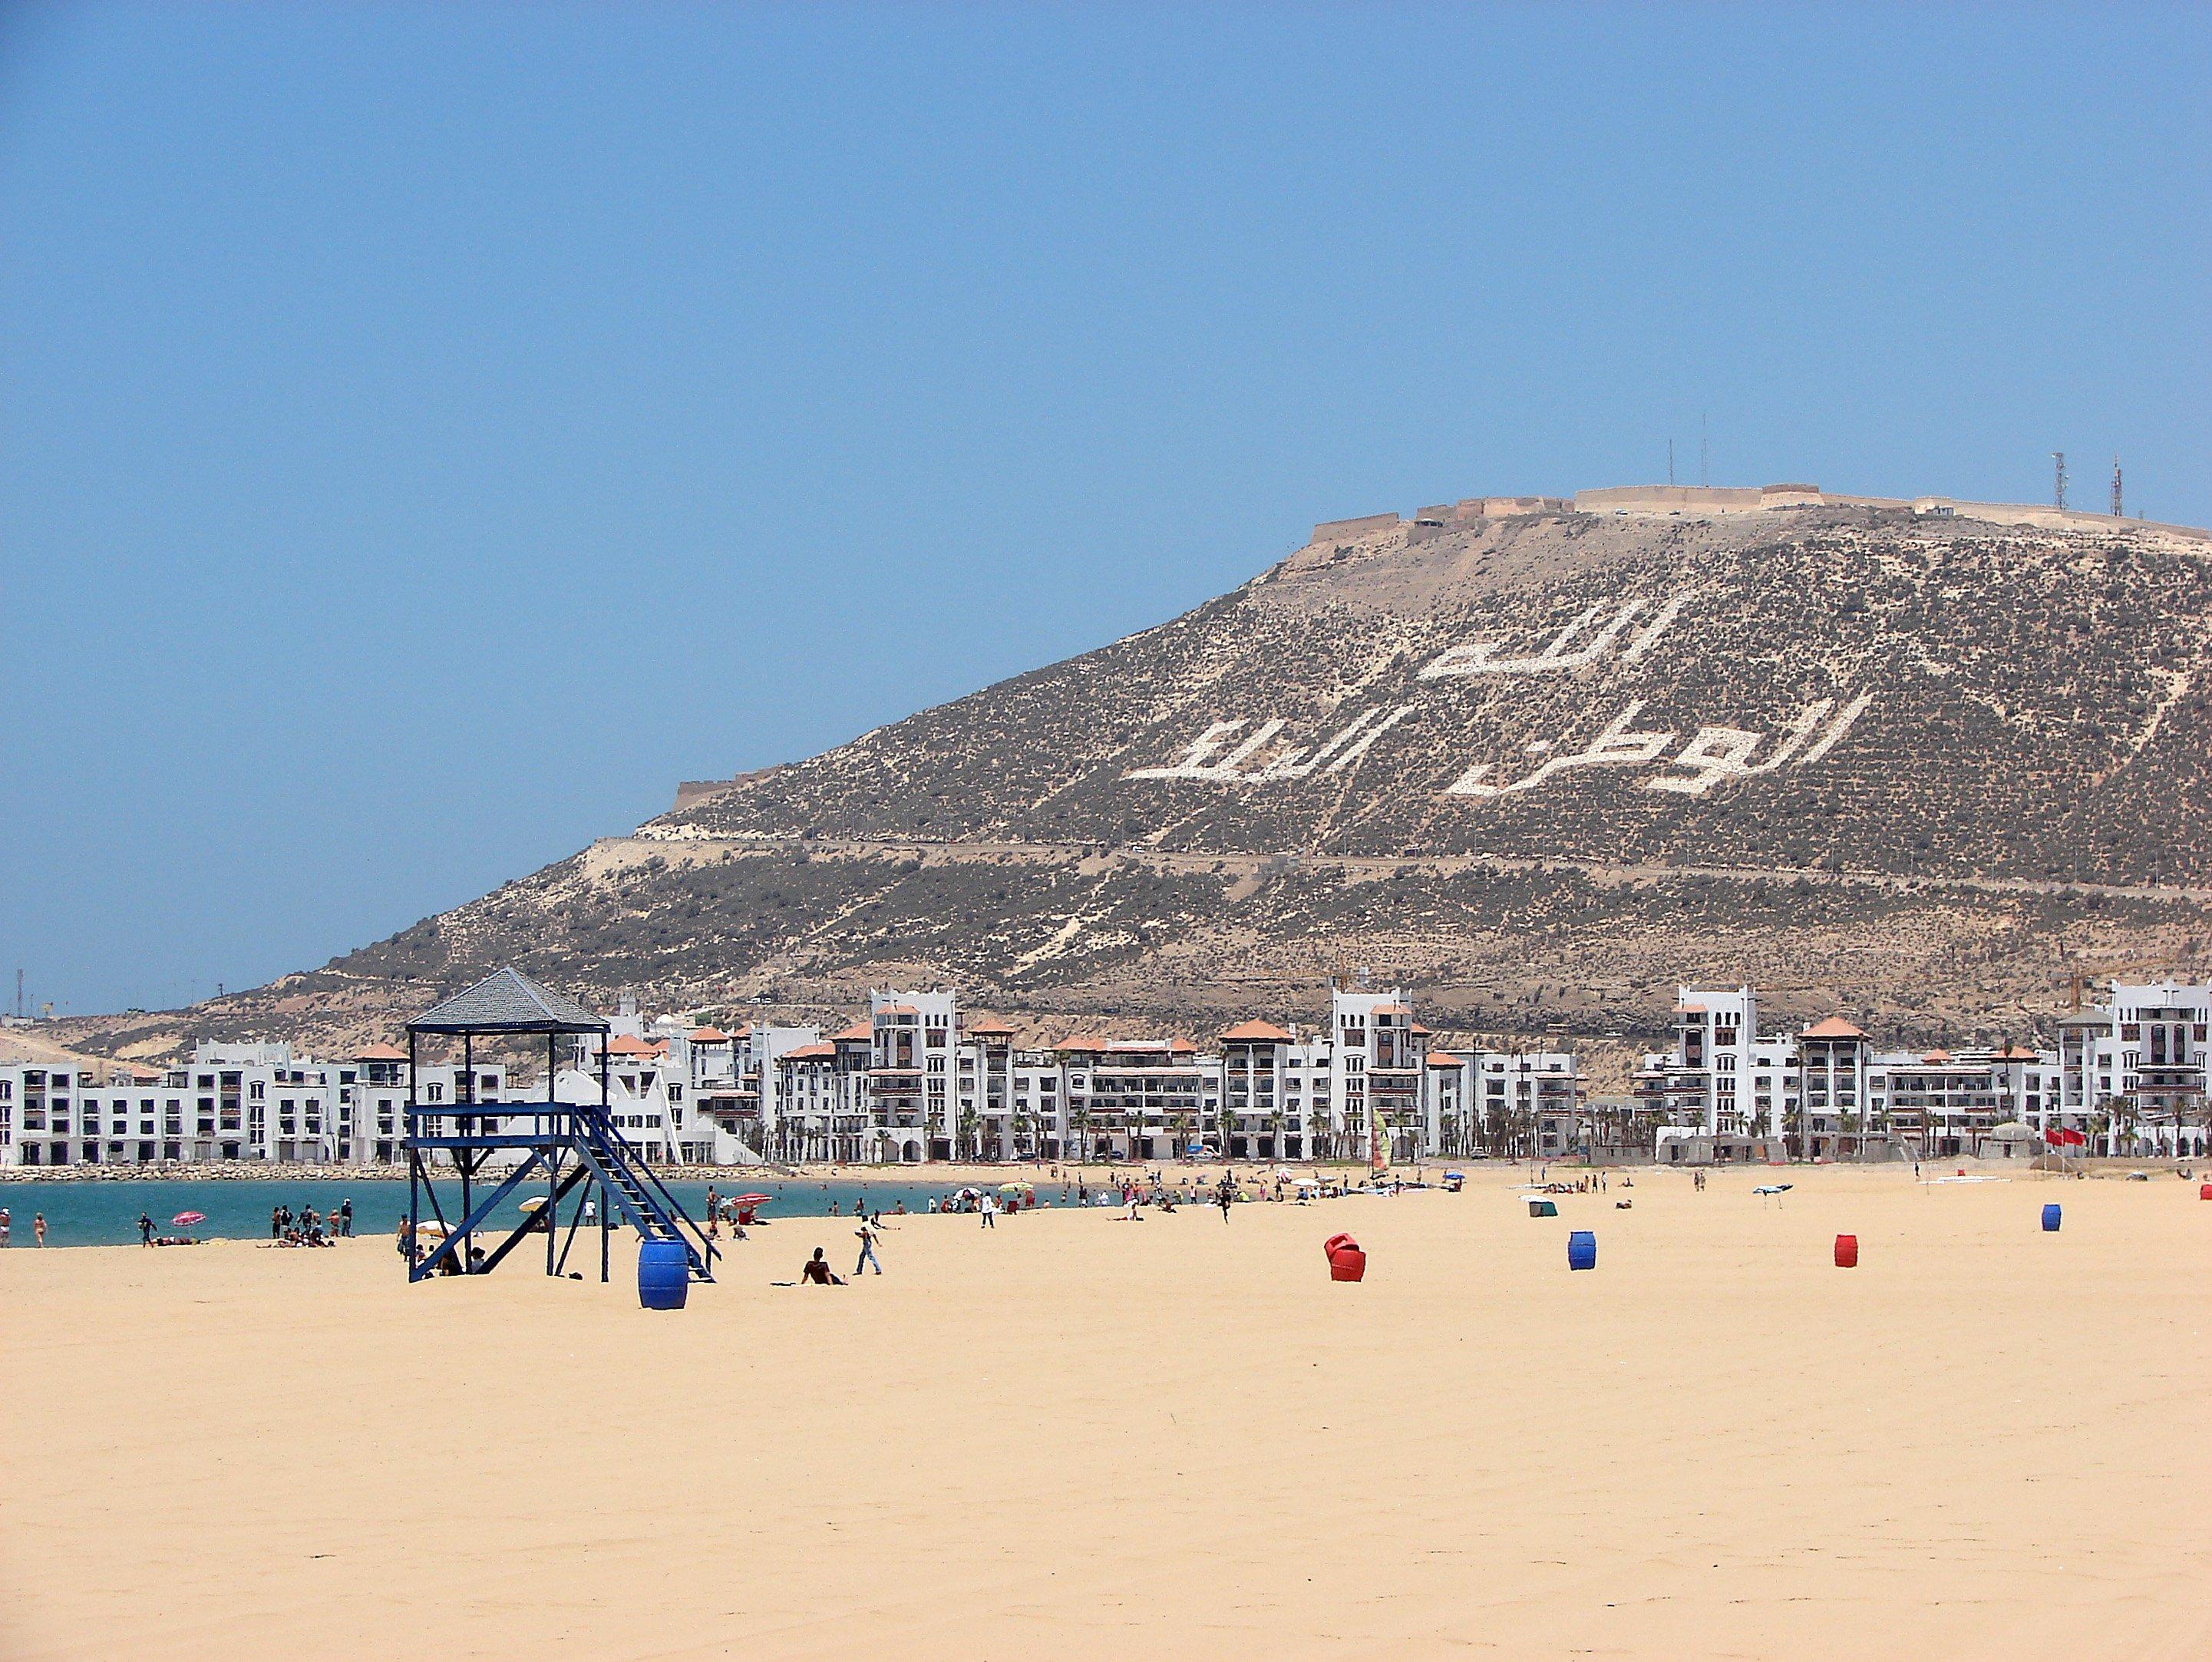 Am Strand von Agadir. Foto: Christian Maskos